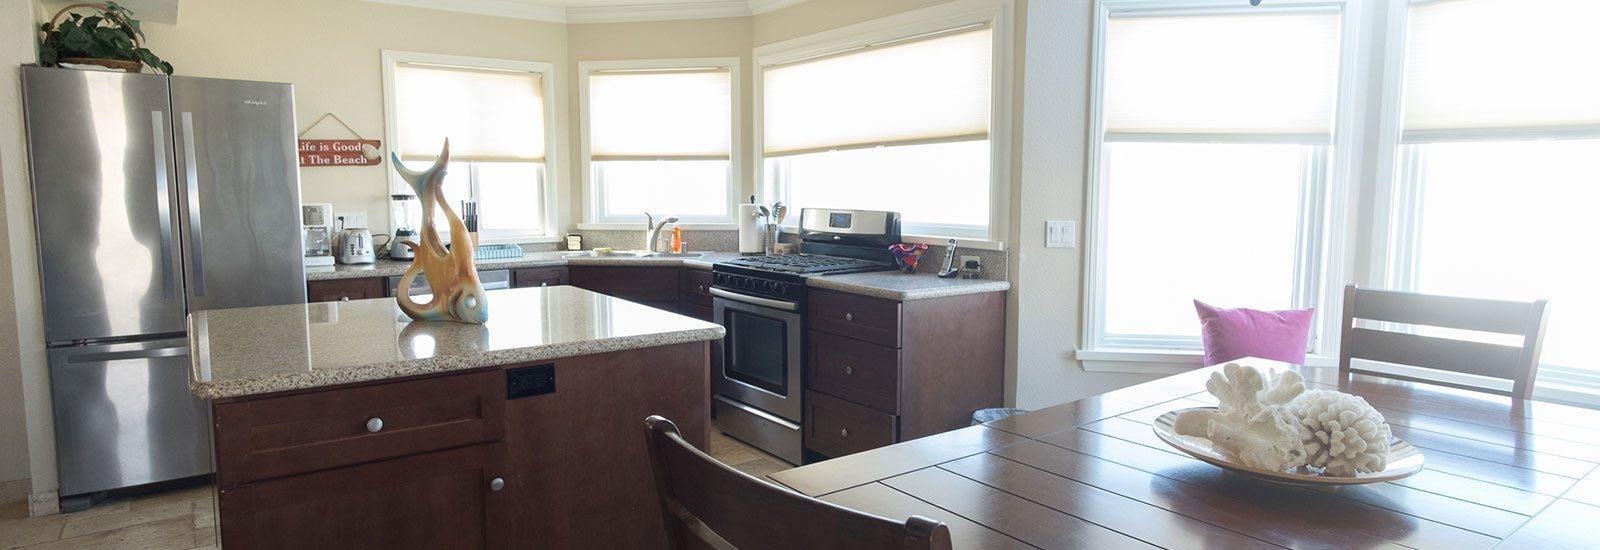 Kitchen-Penthouse-new-1